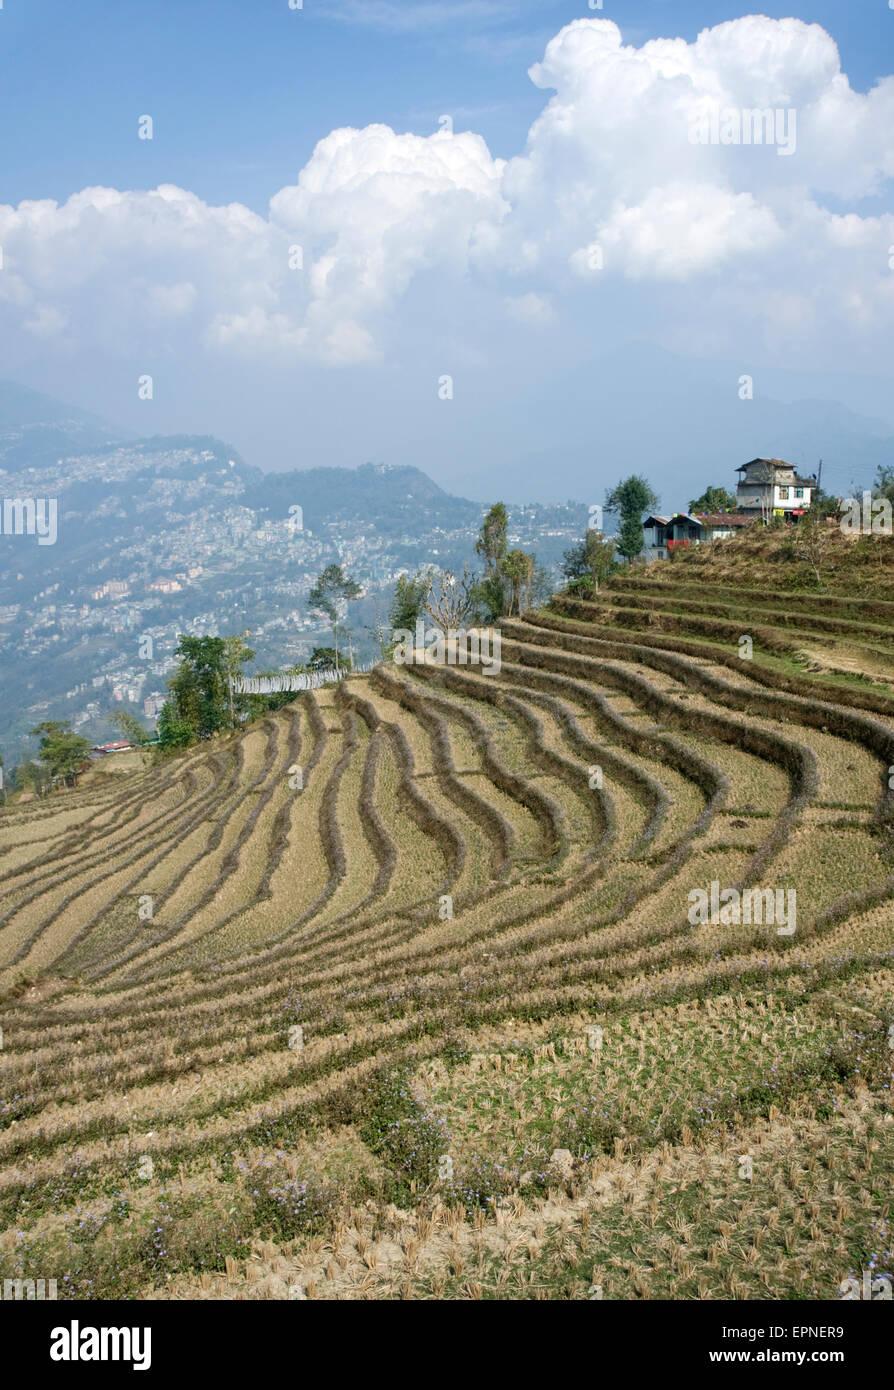 Rice terraces at Sanjur, near Gangtok, Sikkim. - Stock Image